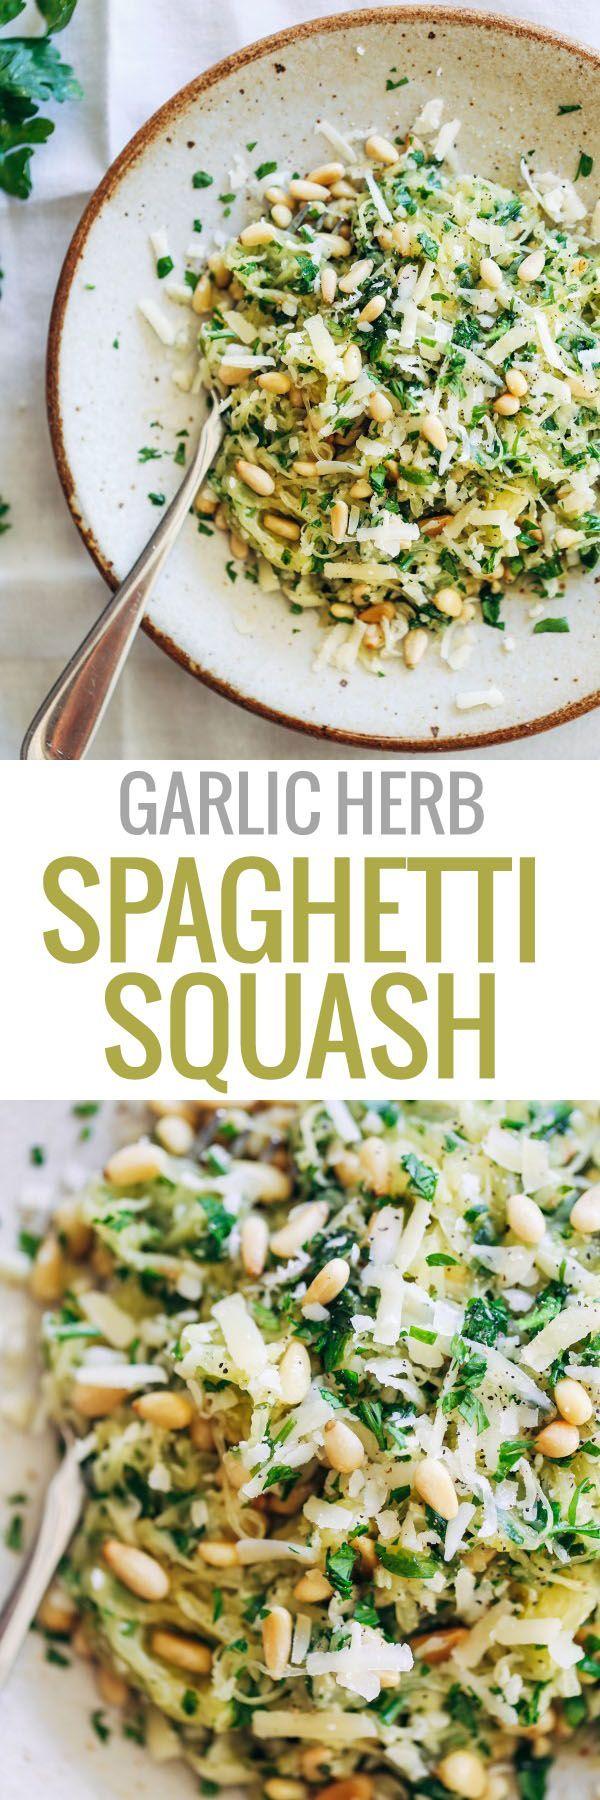 Garlic Spaghetti Squash with Herbs + pine nuts and Gruyère cheese. 300 calories.